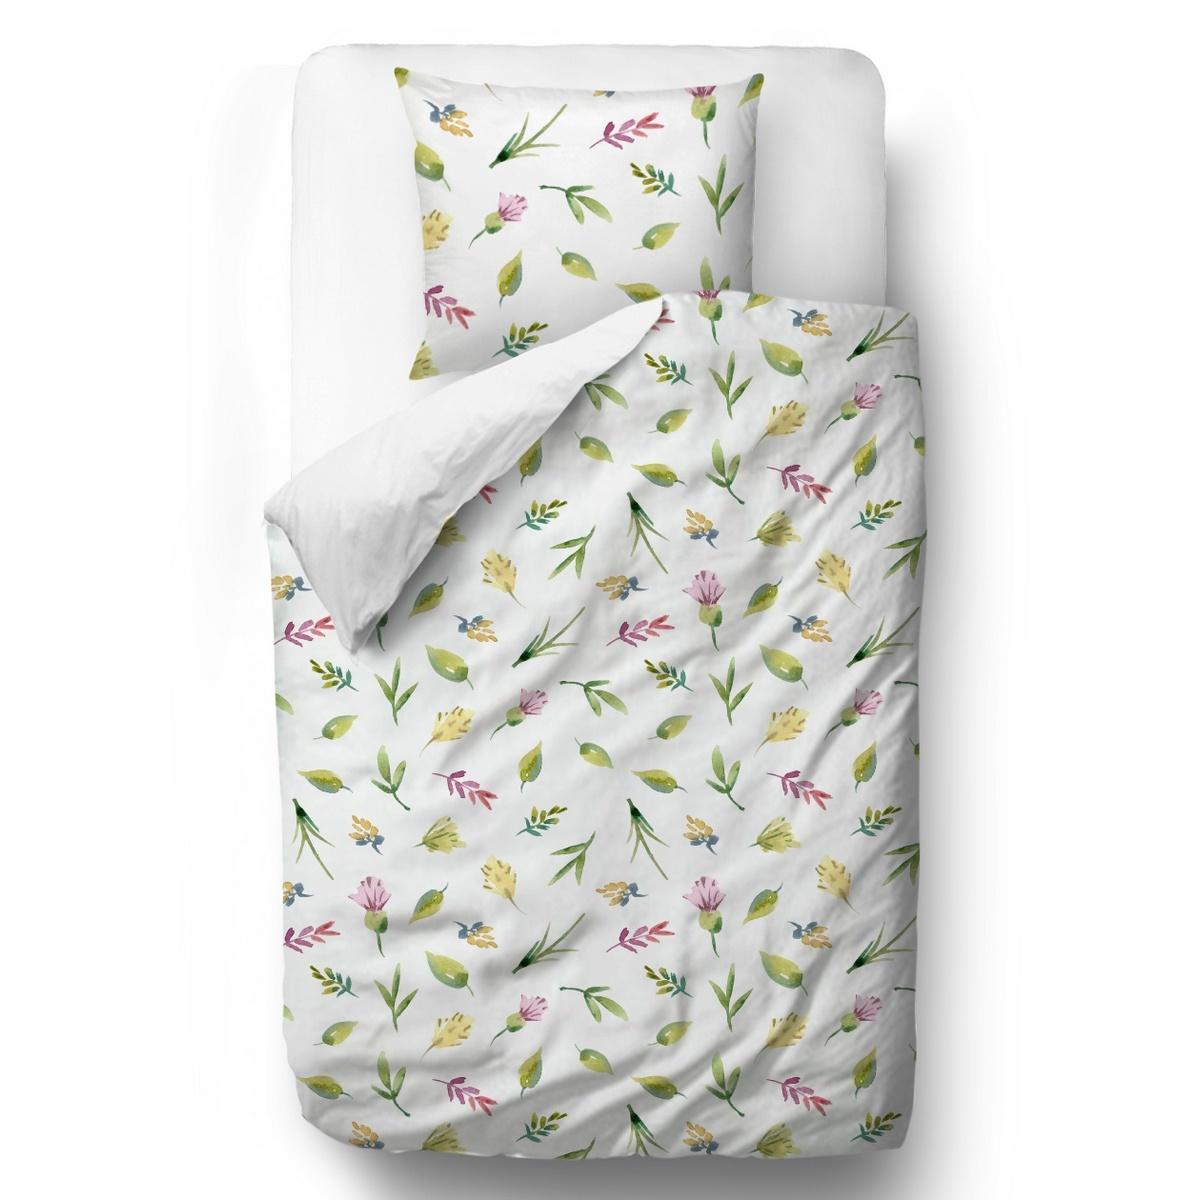 Butter Kings Saténové obliečky Blooming meadow, 140 x 200 cm, 70 x 90 cm